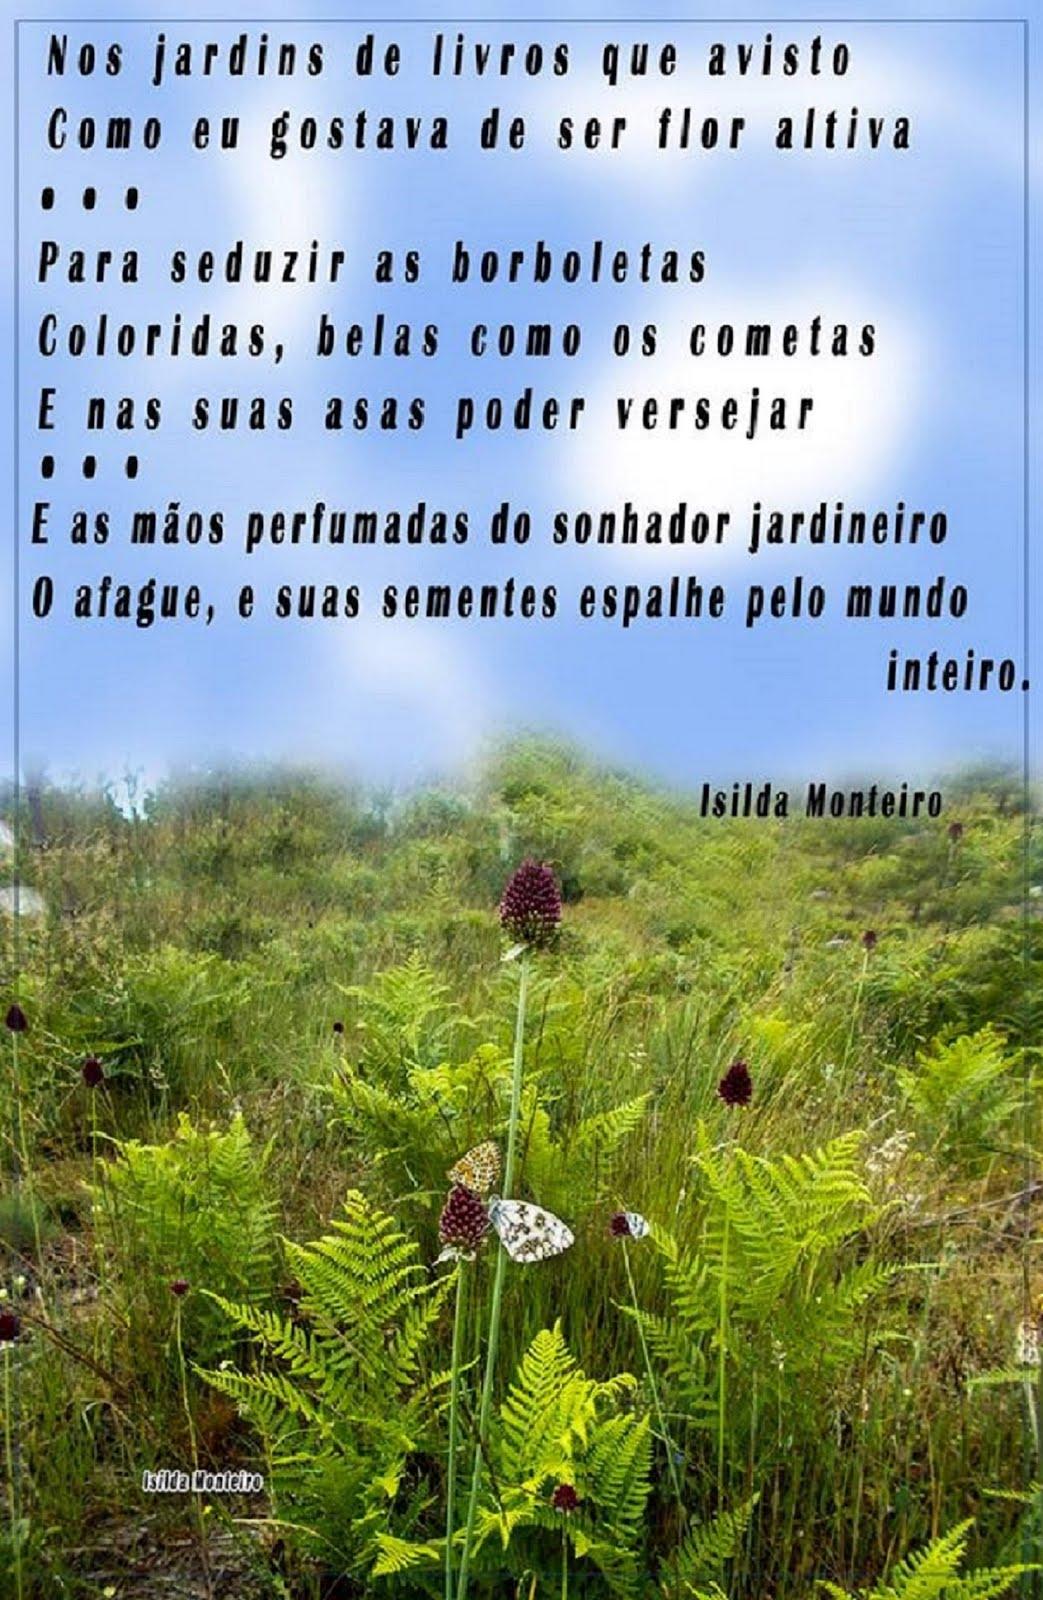 © ISILDA  MONTEIRO